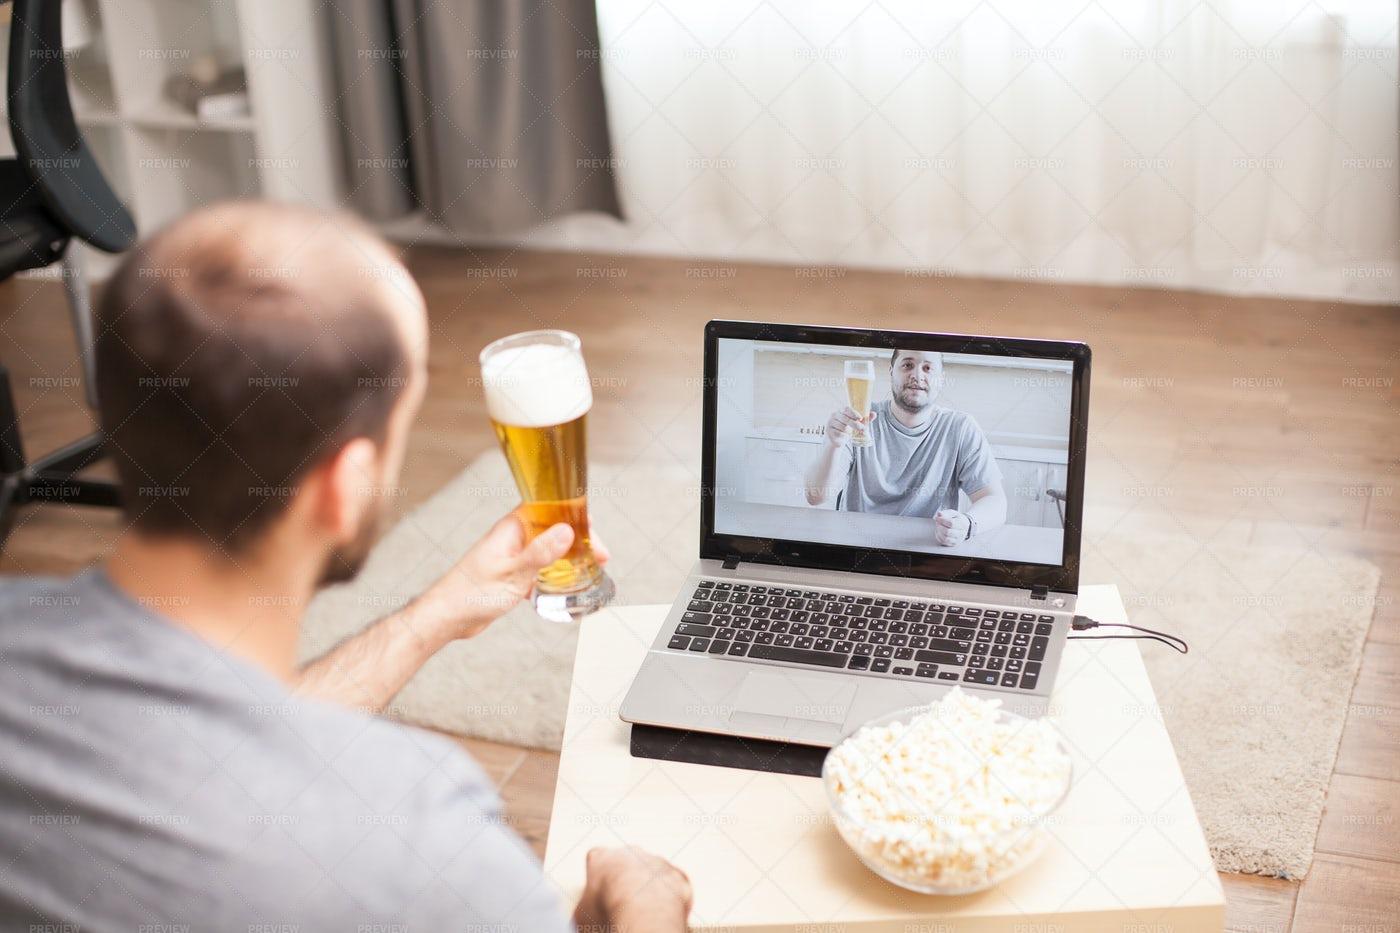 Virtual Cheers: Stock Photos